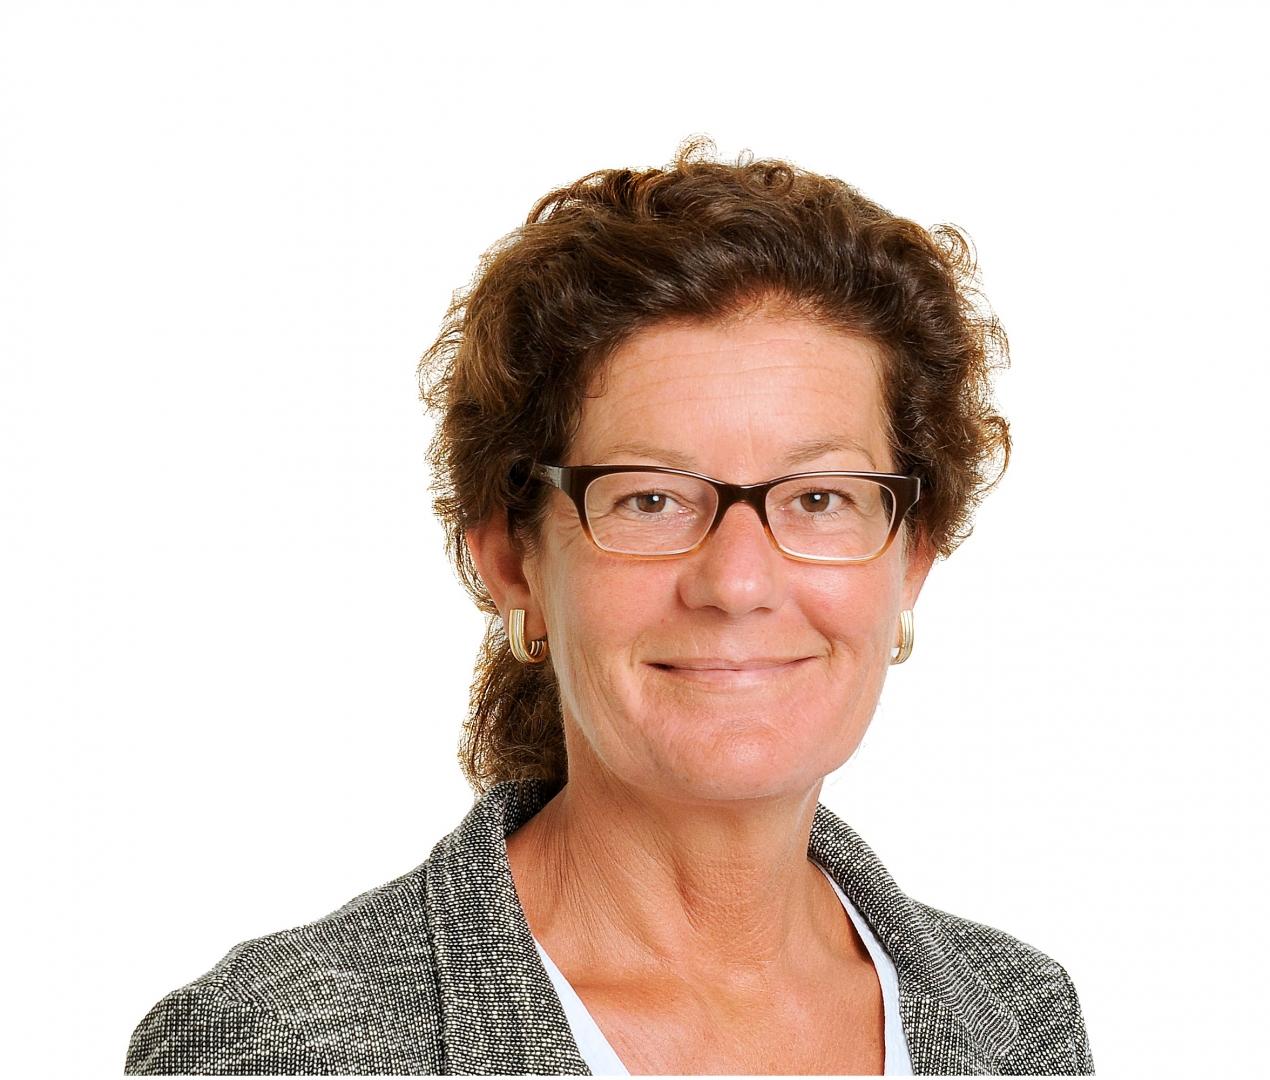 Mein Sessionsbericht zur September-Session 2018 Kantonsrat Luzern